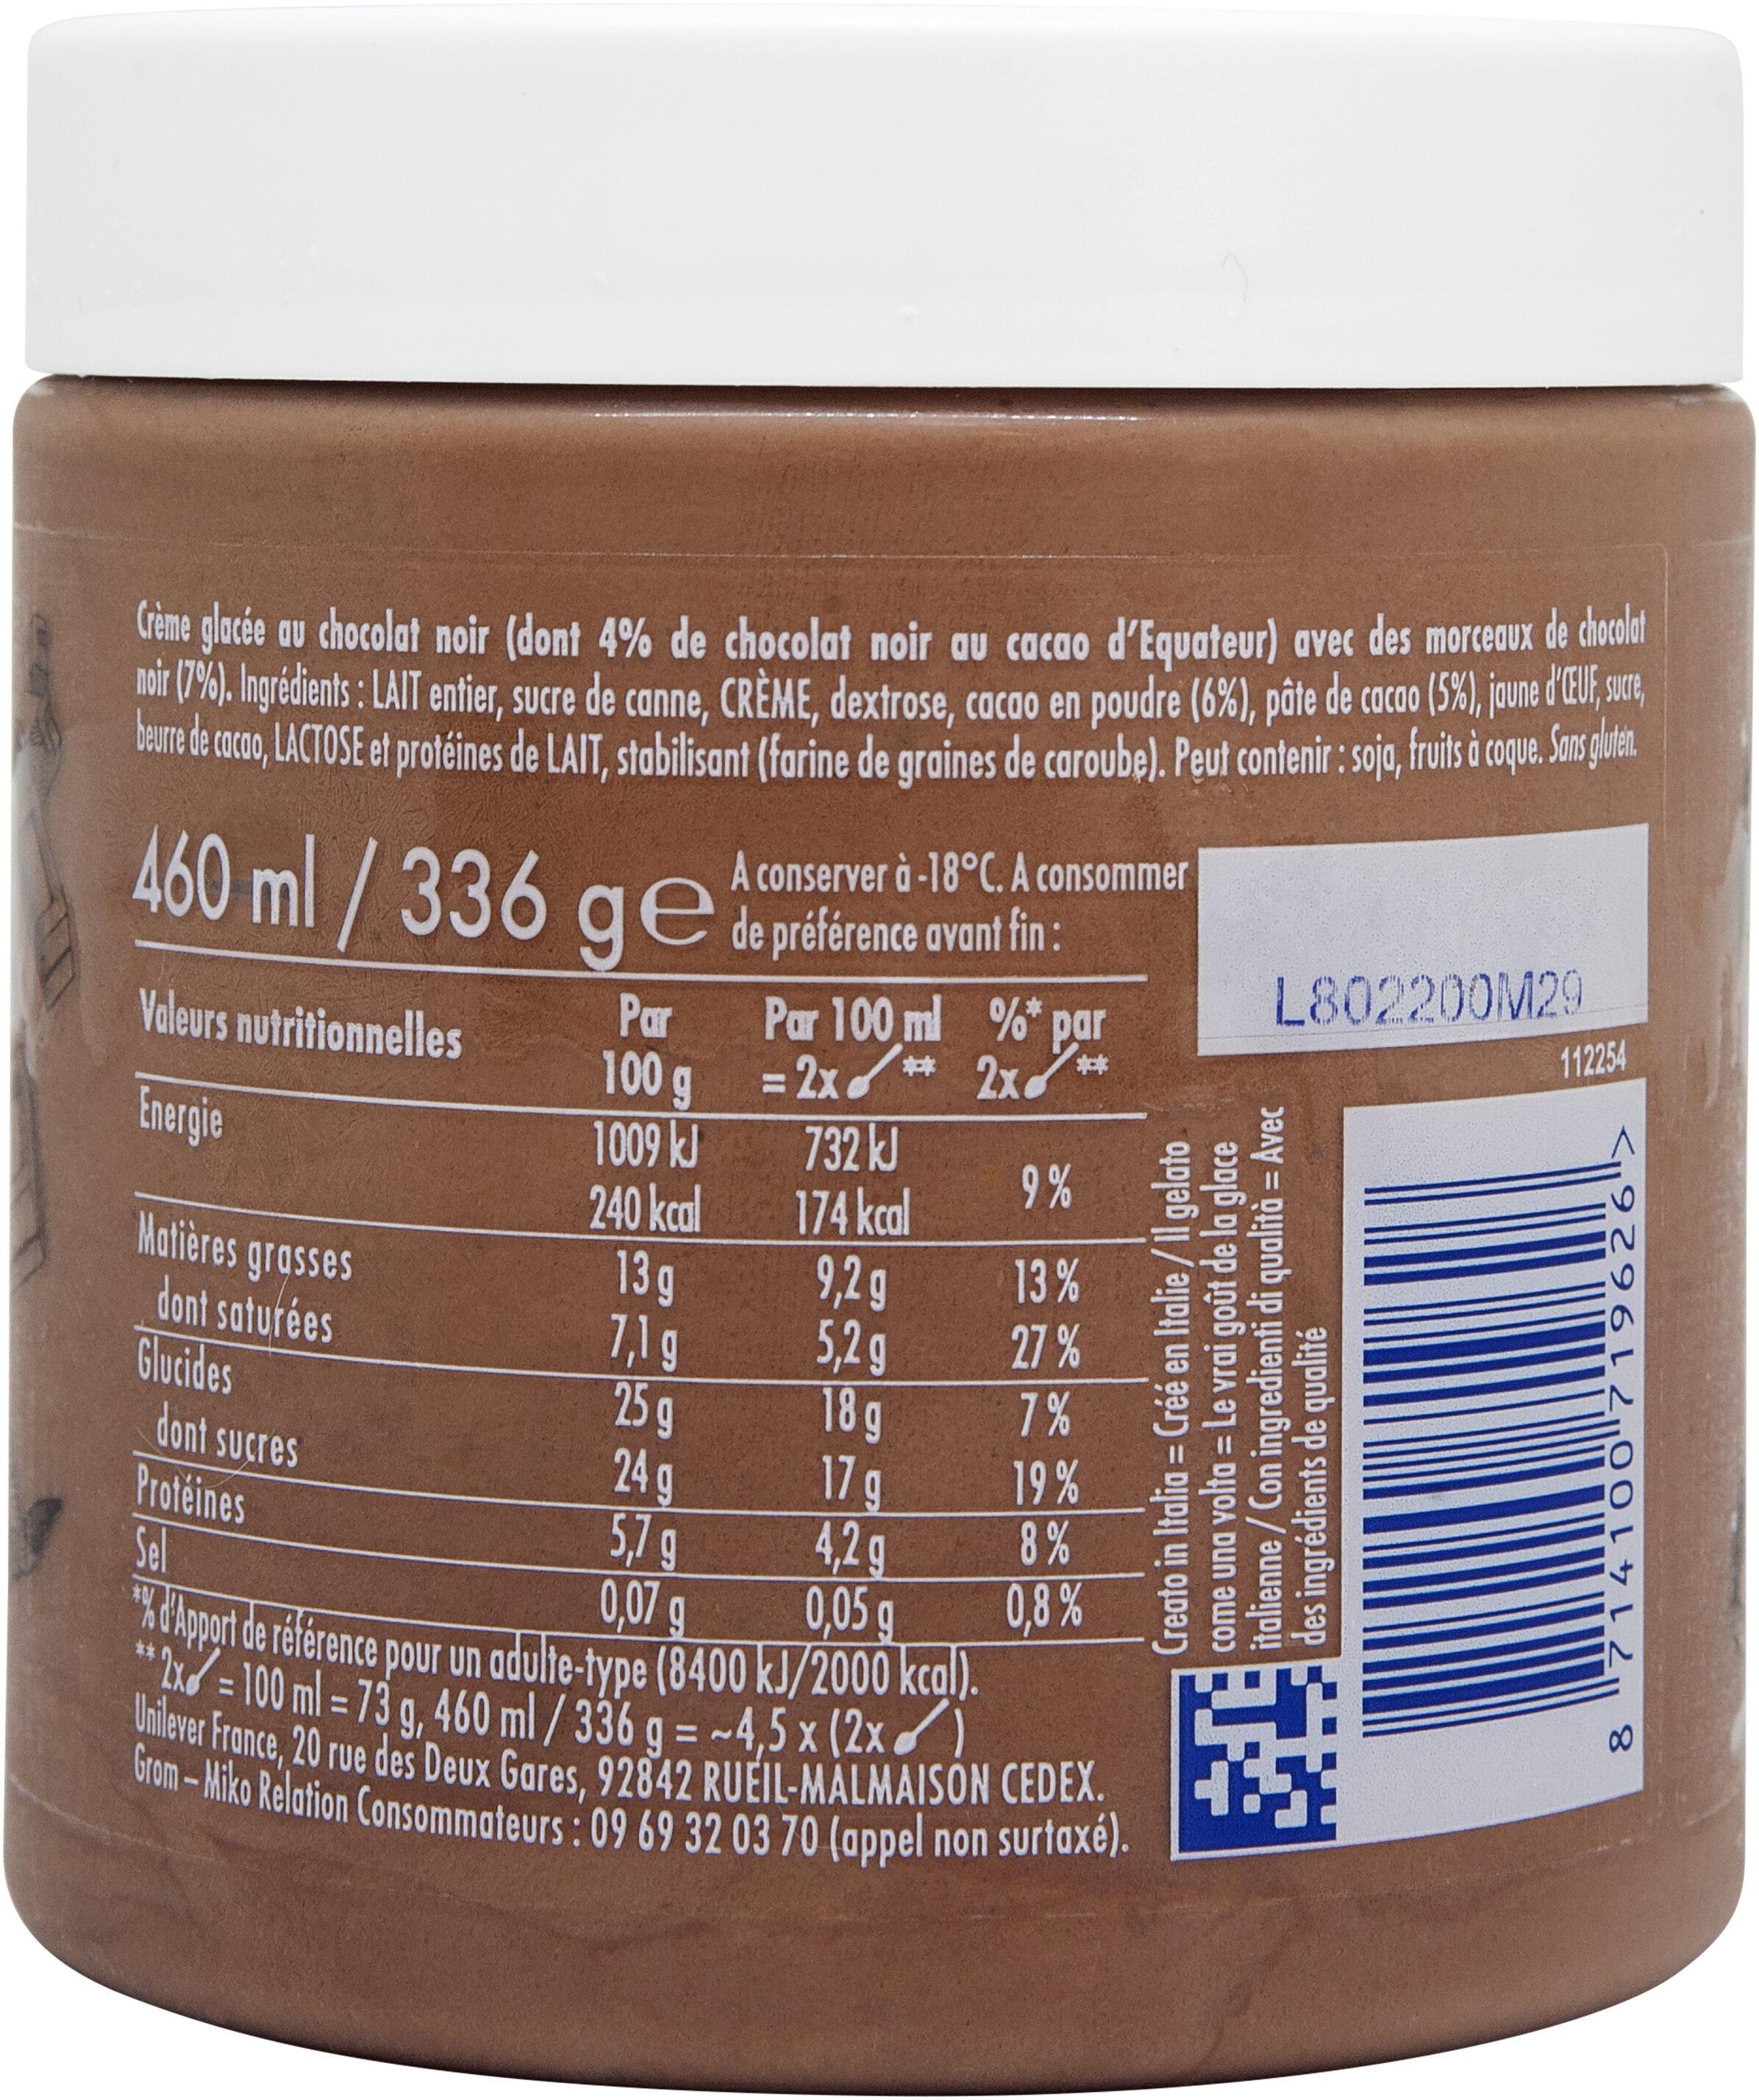 Grom Crème Glacée Pot Chocolat Noir 460ml - Voedingswaarden - fr